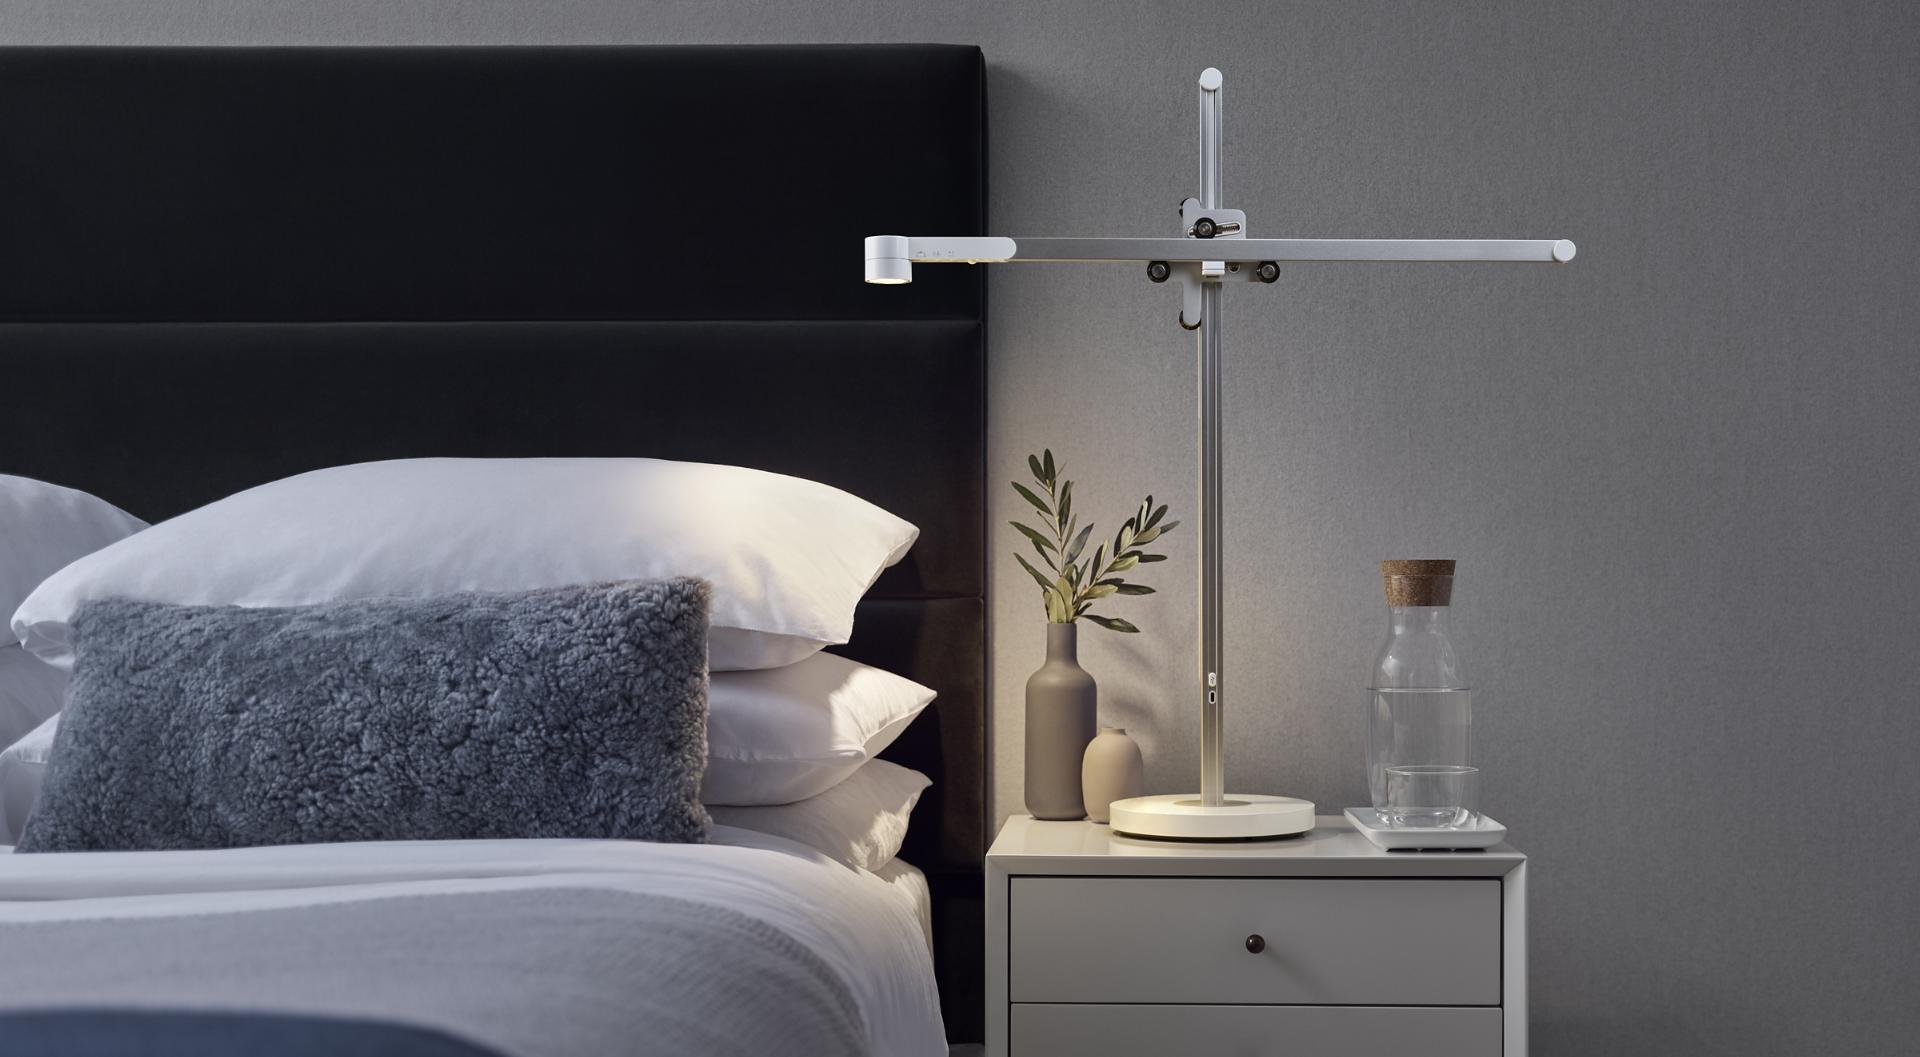 Dyson Lightcycle task light on a bedside table